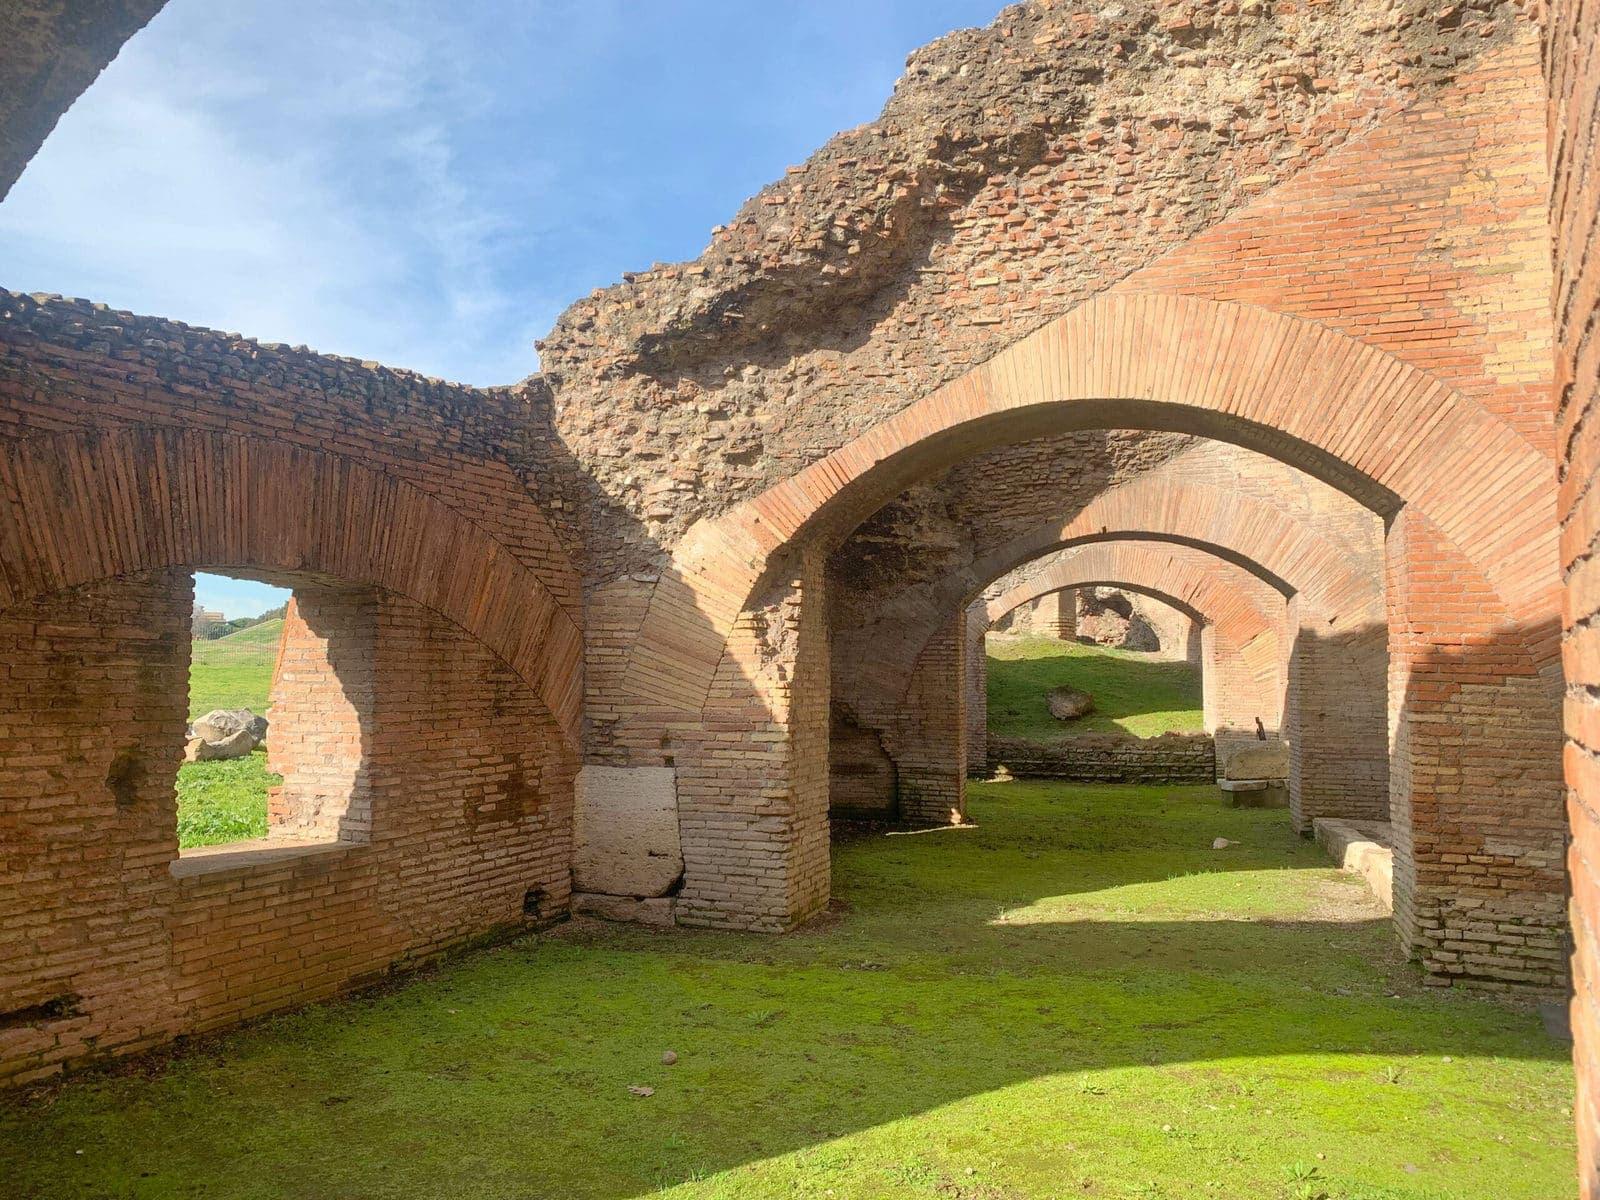 Circus Maximus Rom: Ausgrabungsstätte